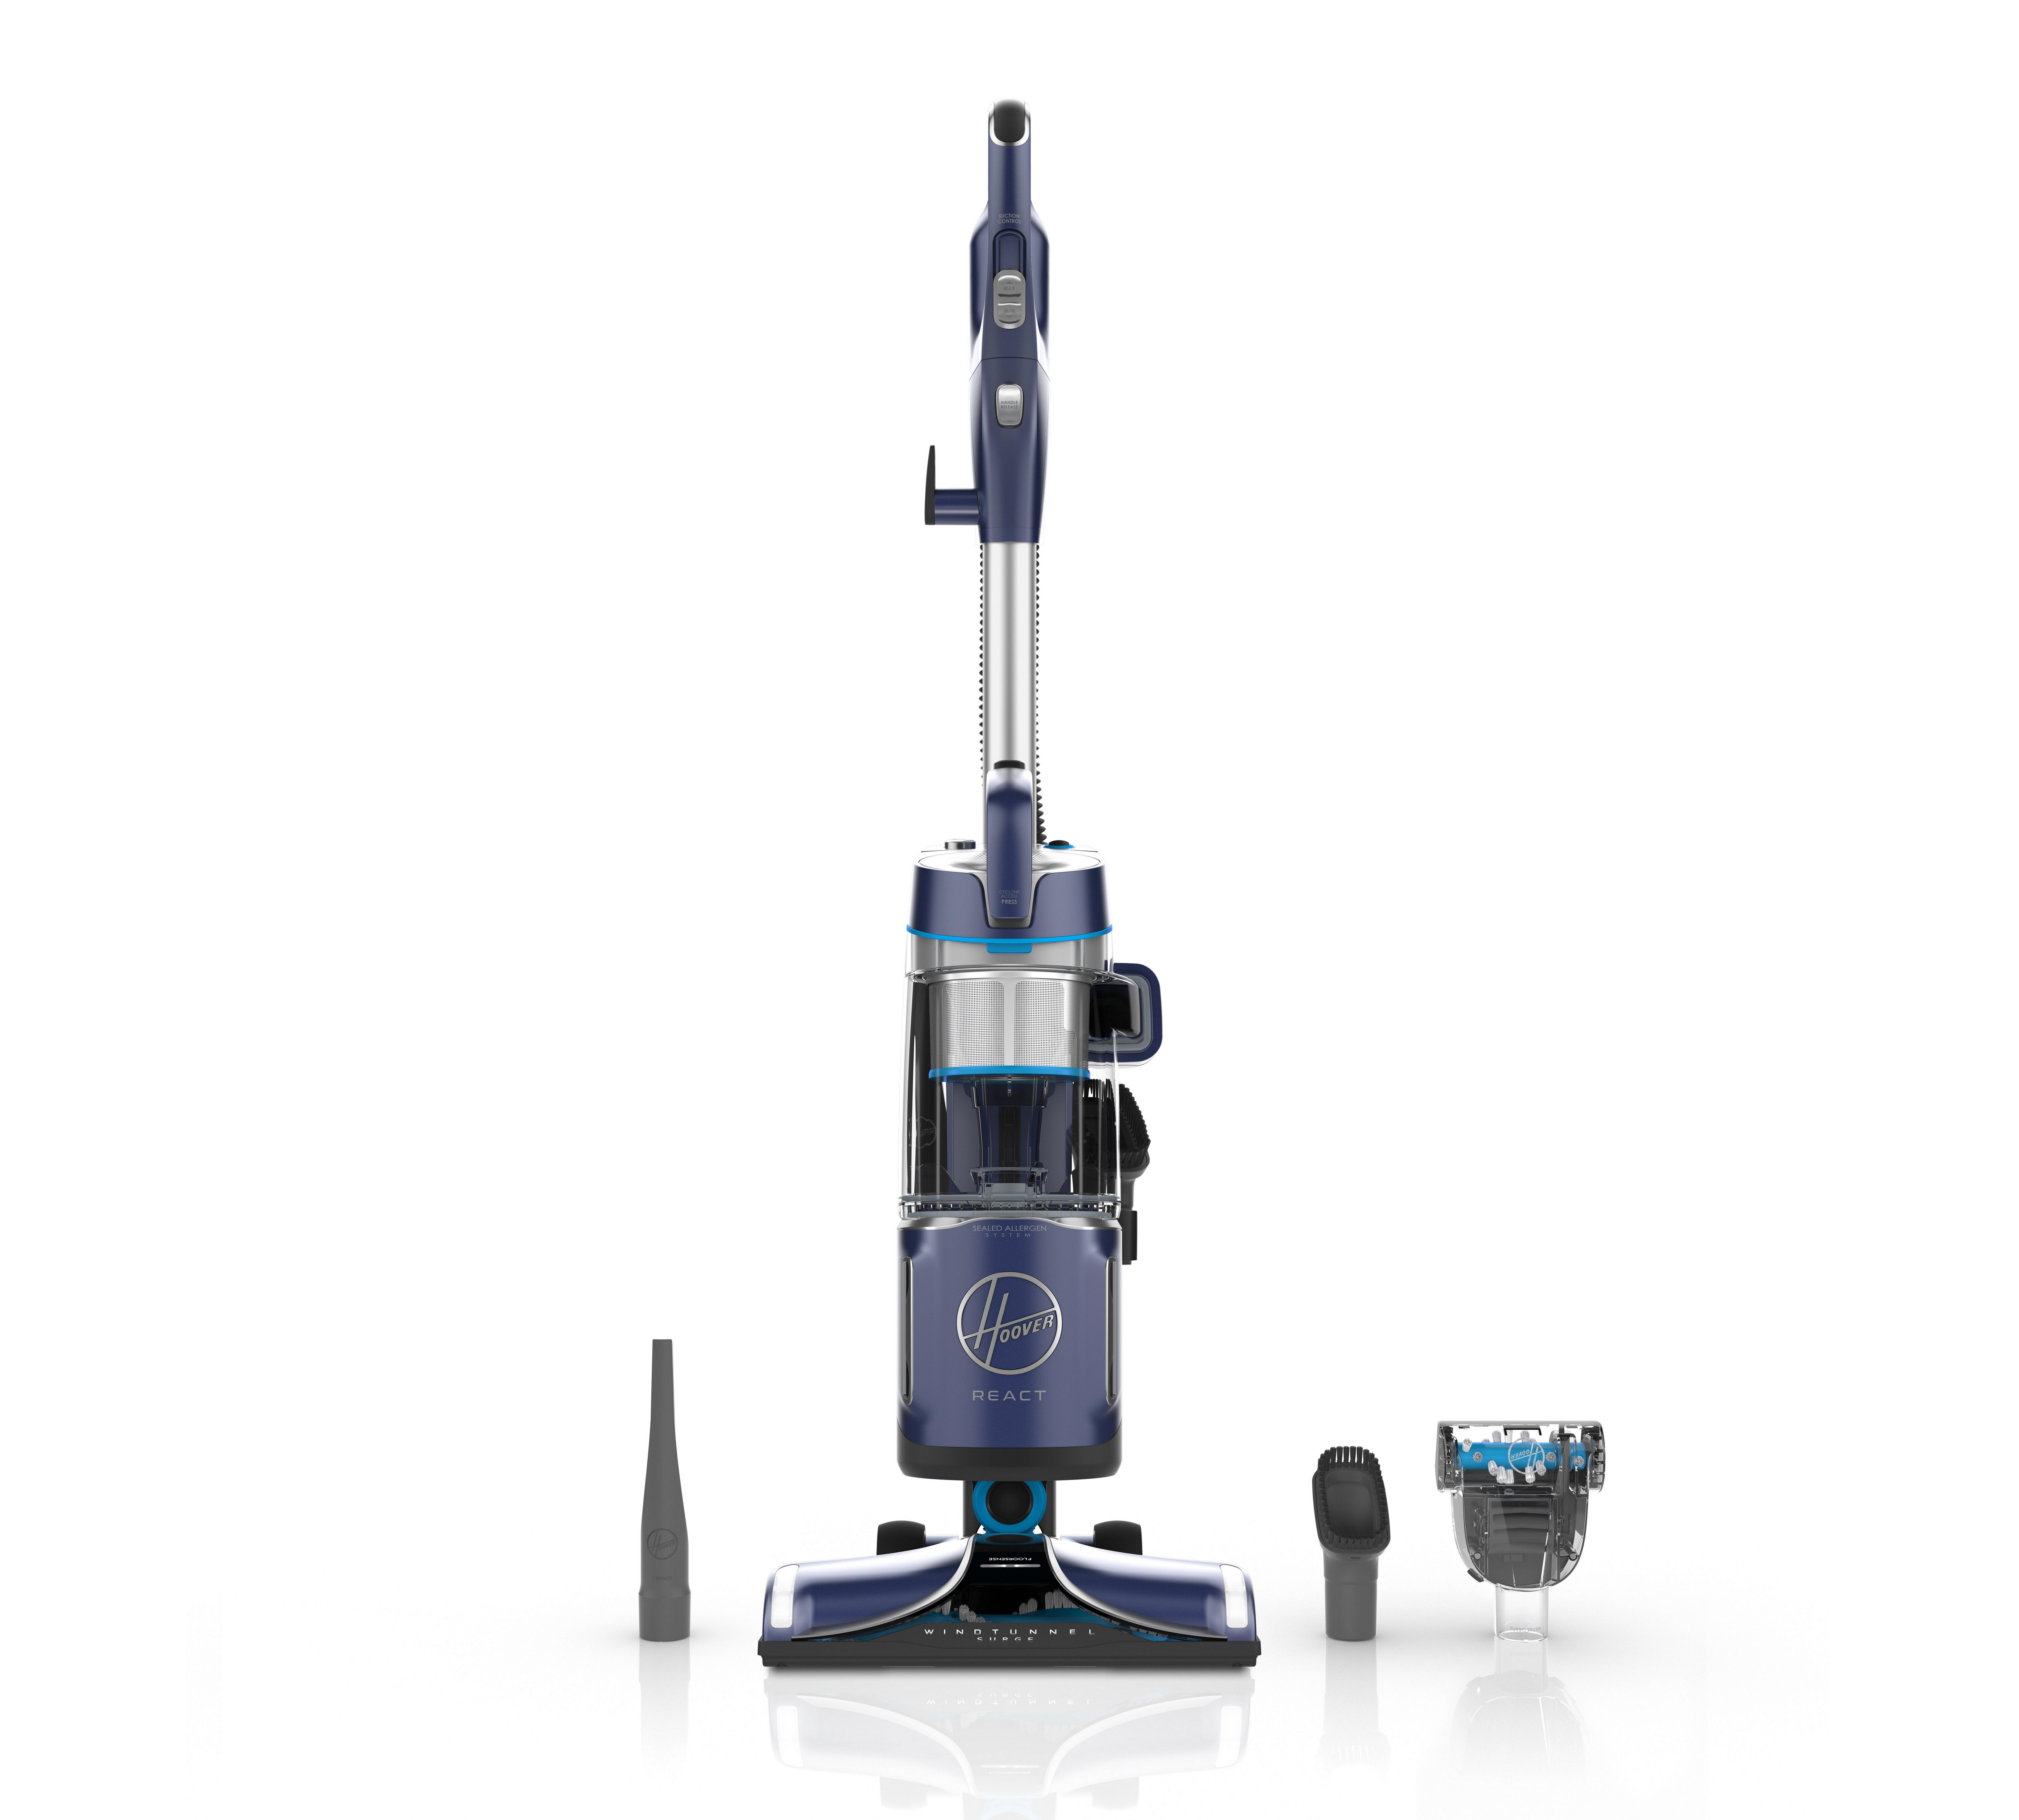 REACT Powered Reach Lite Upright Vacuum